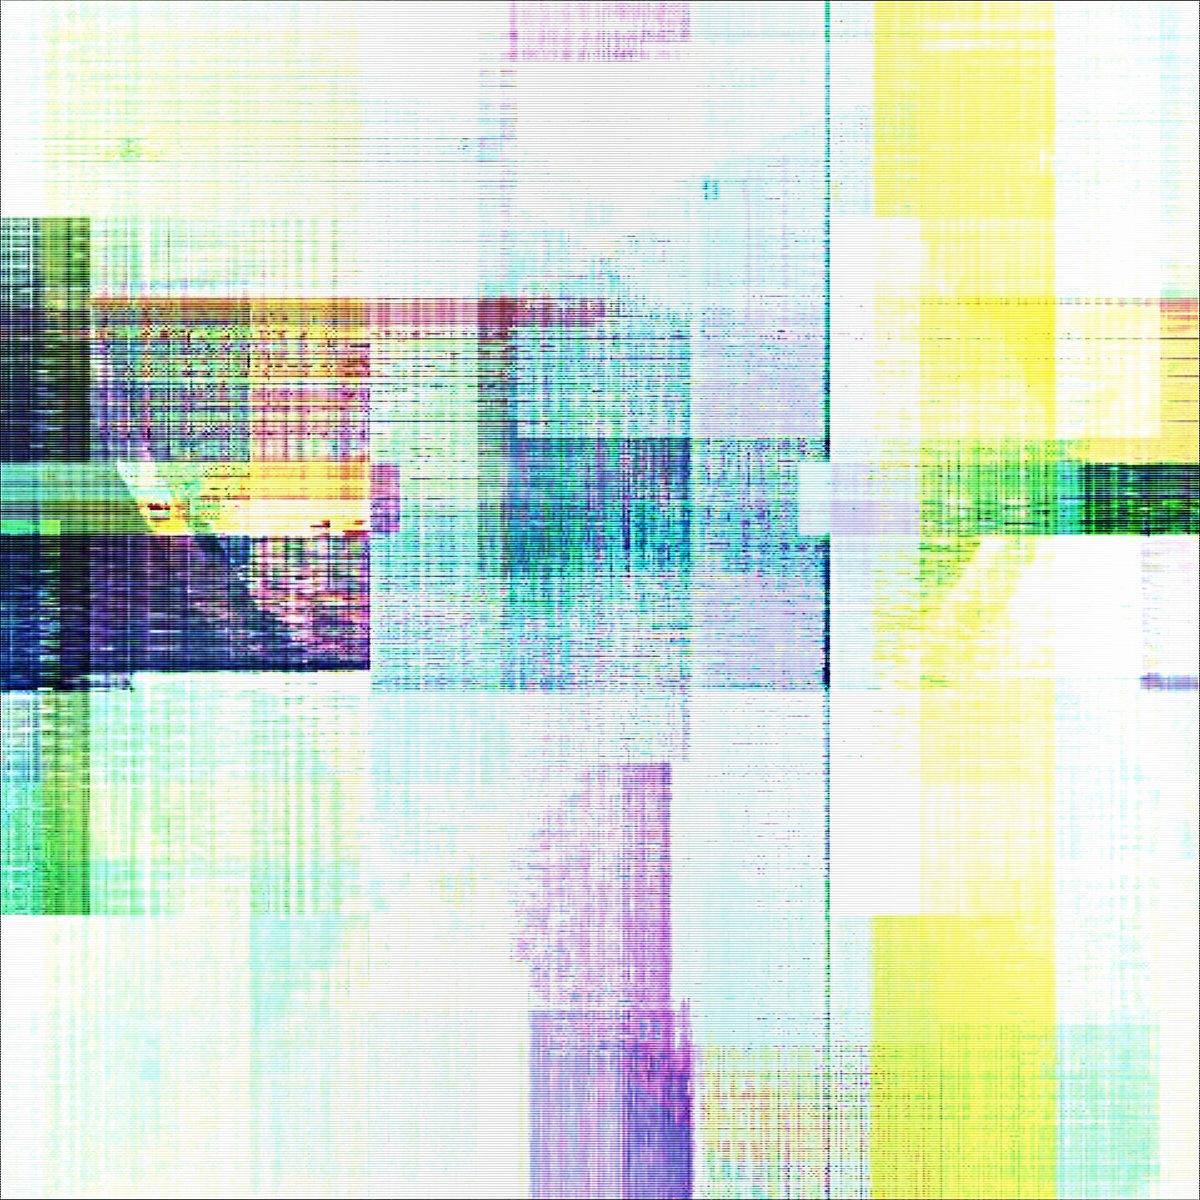 a1956401248_10.jpg